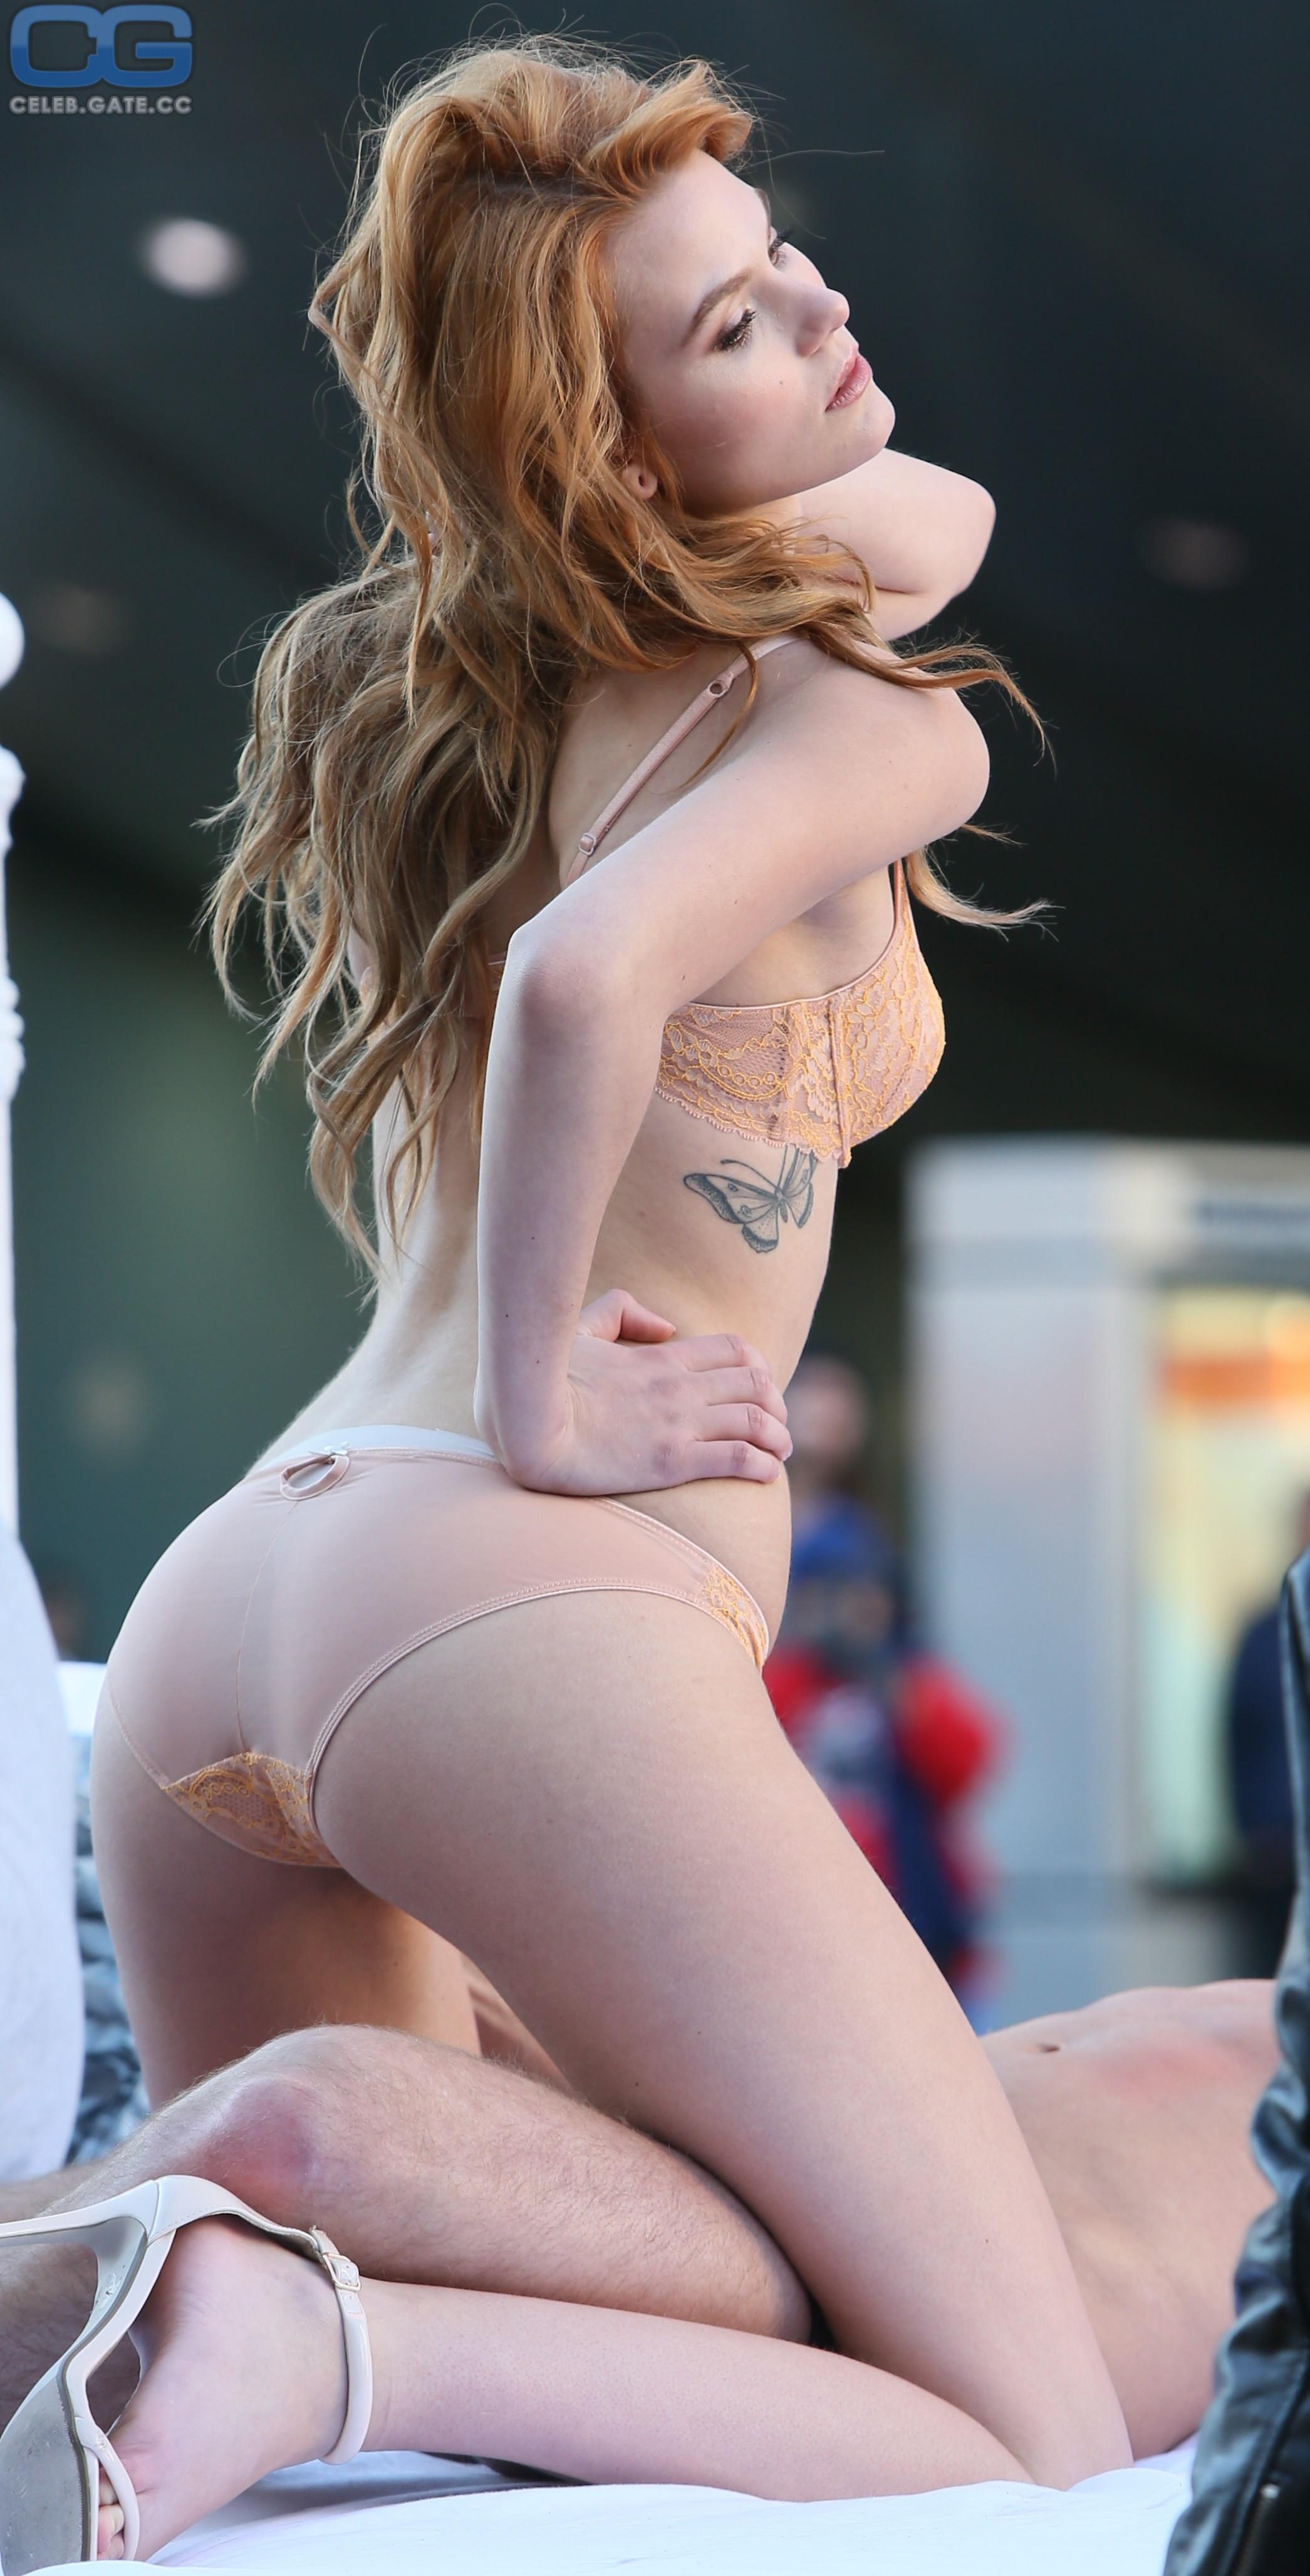 Lynn gntm nude